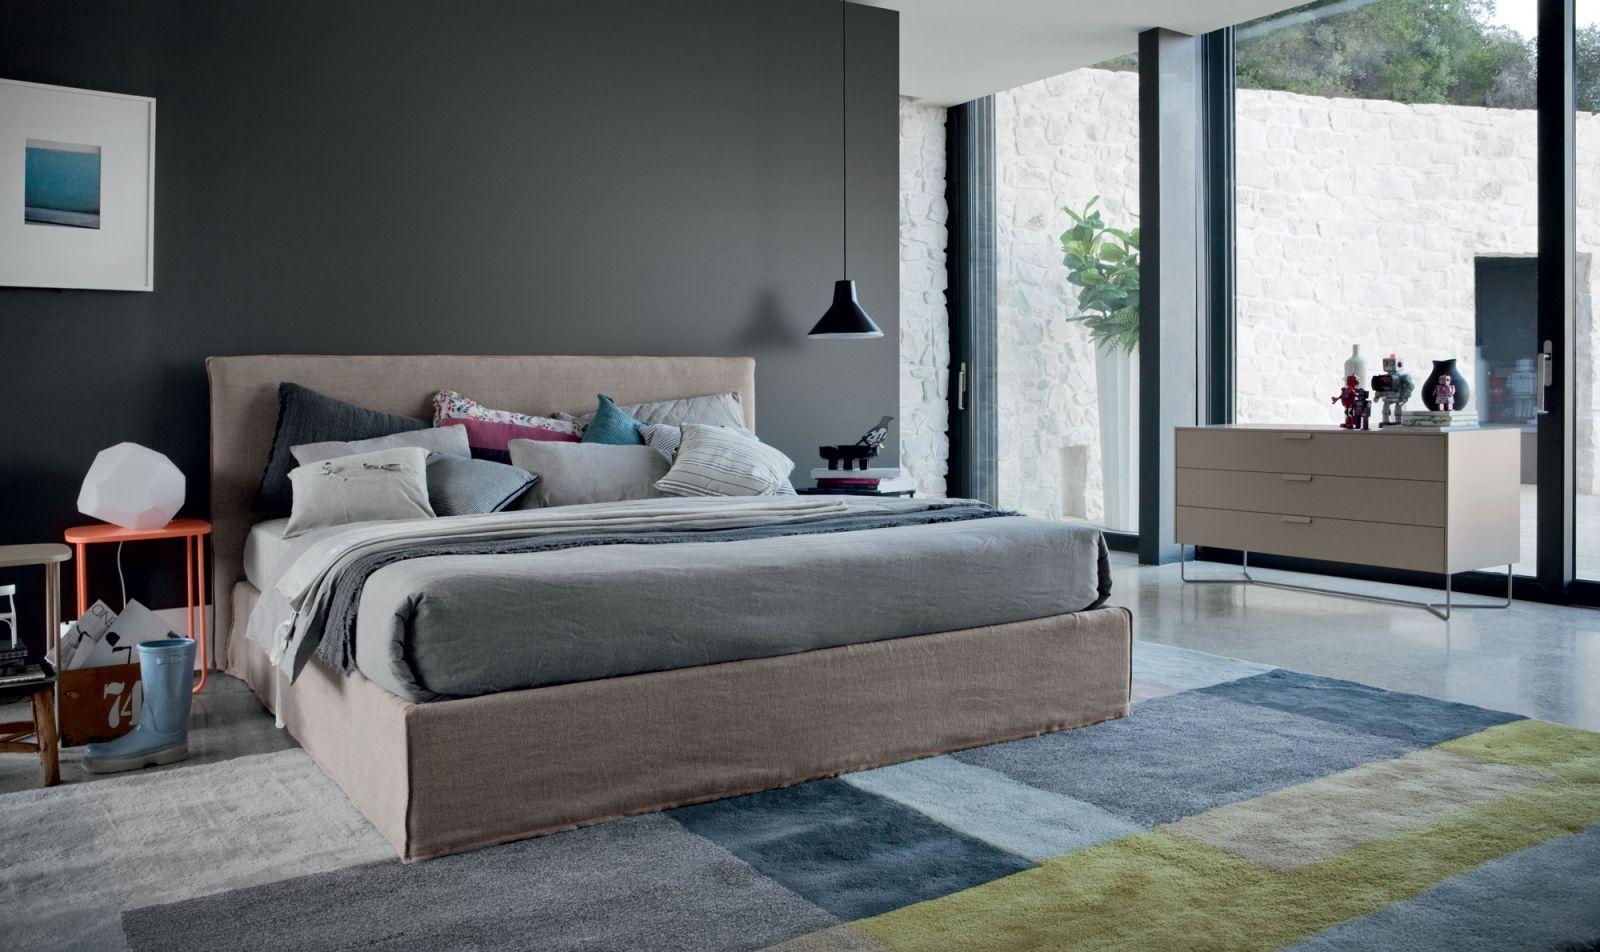 Slimline Bedroom Furniture Novamobili Twiggy Letto Tempo Notte Design Made In Italy